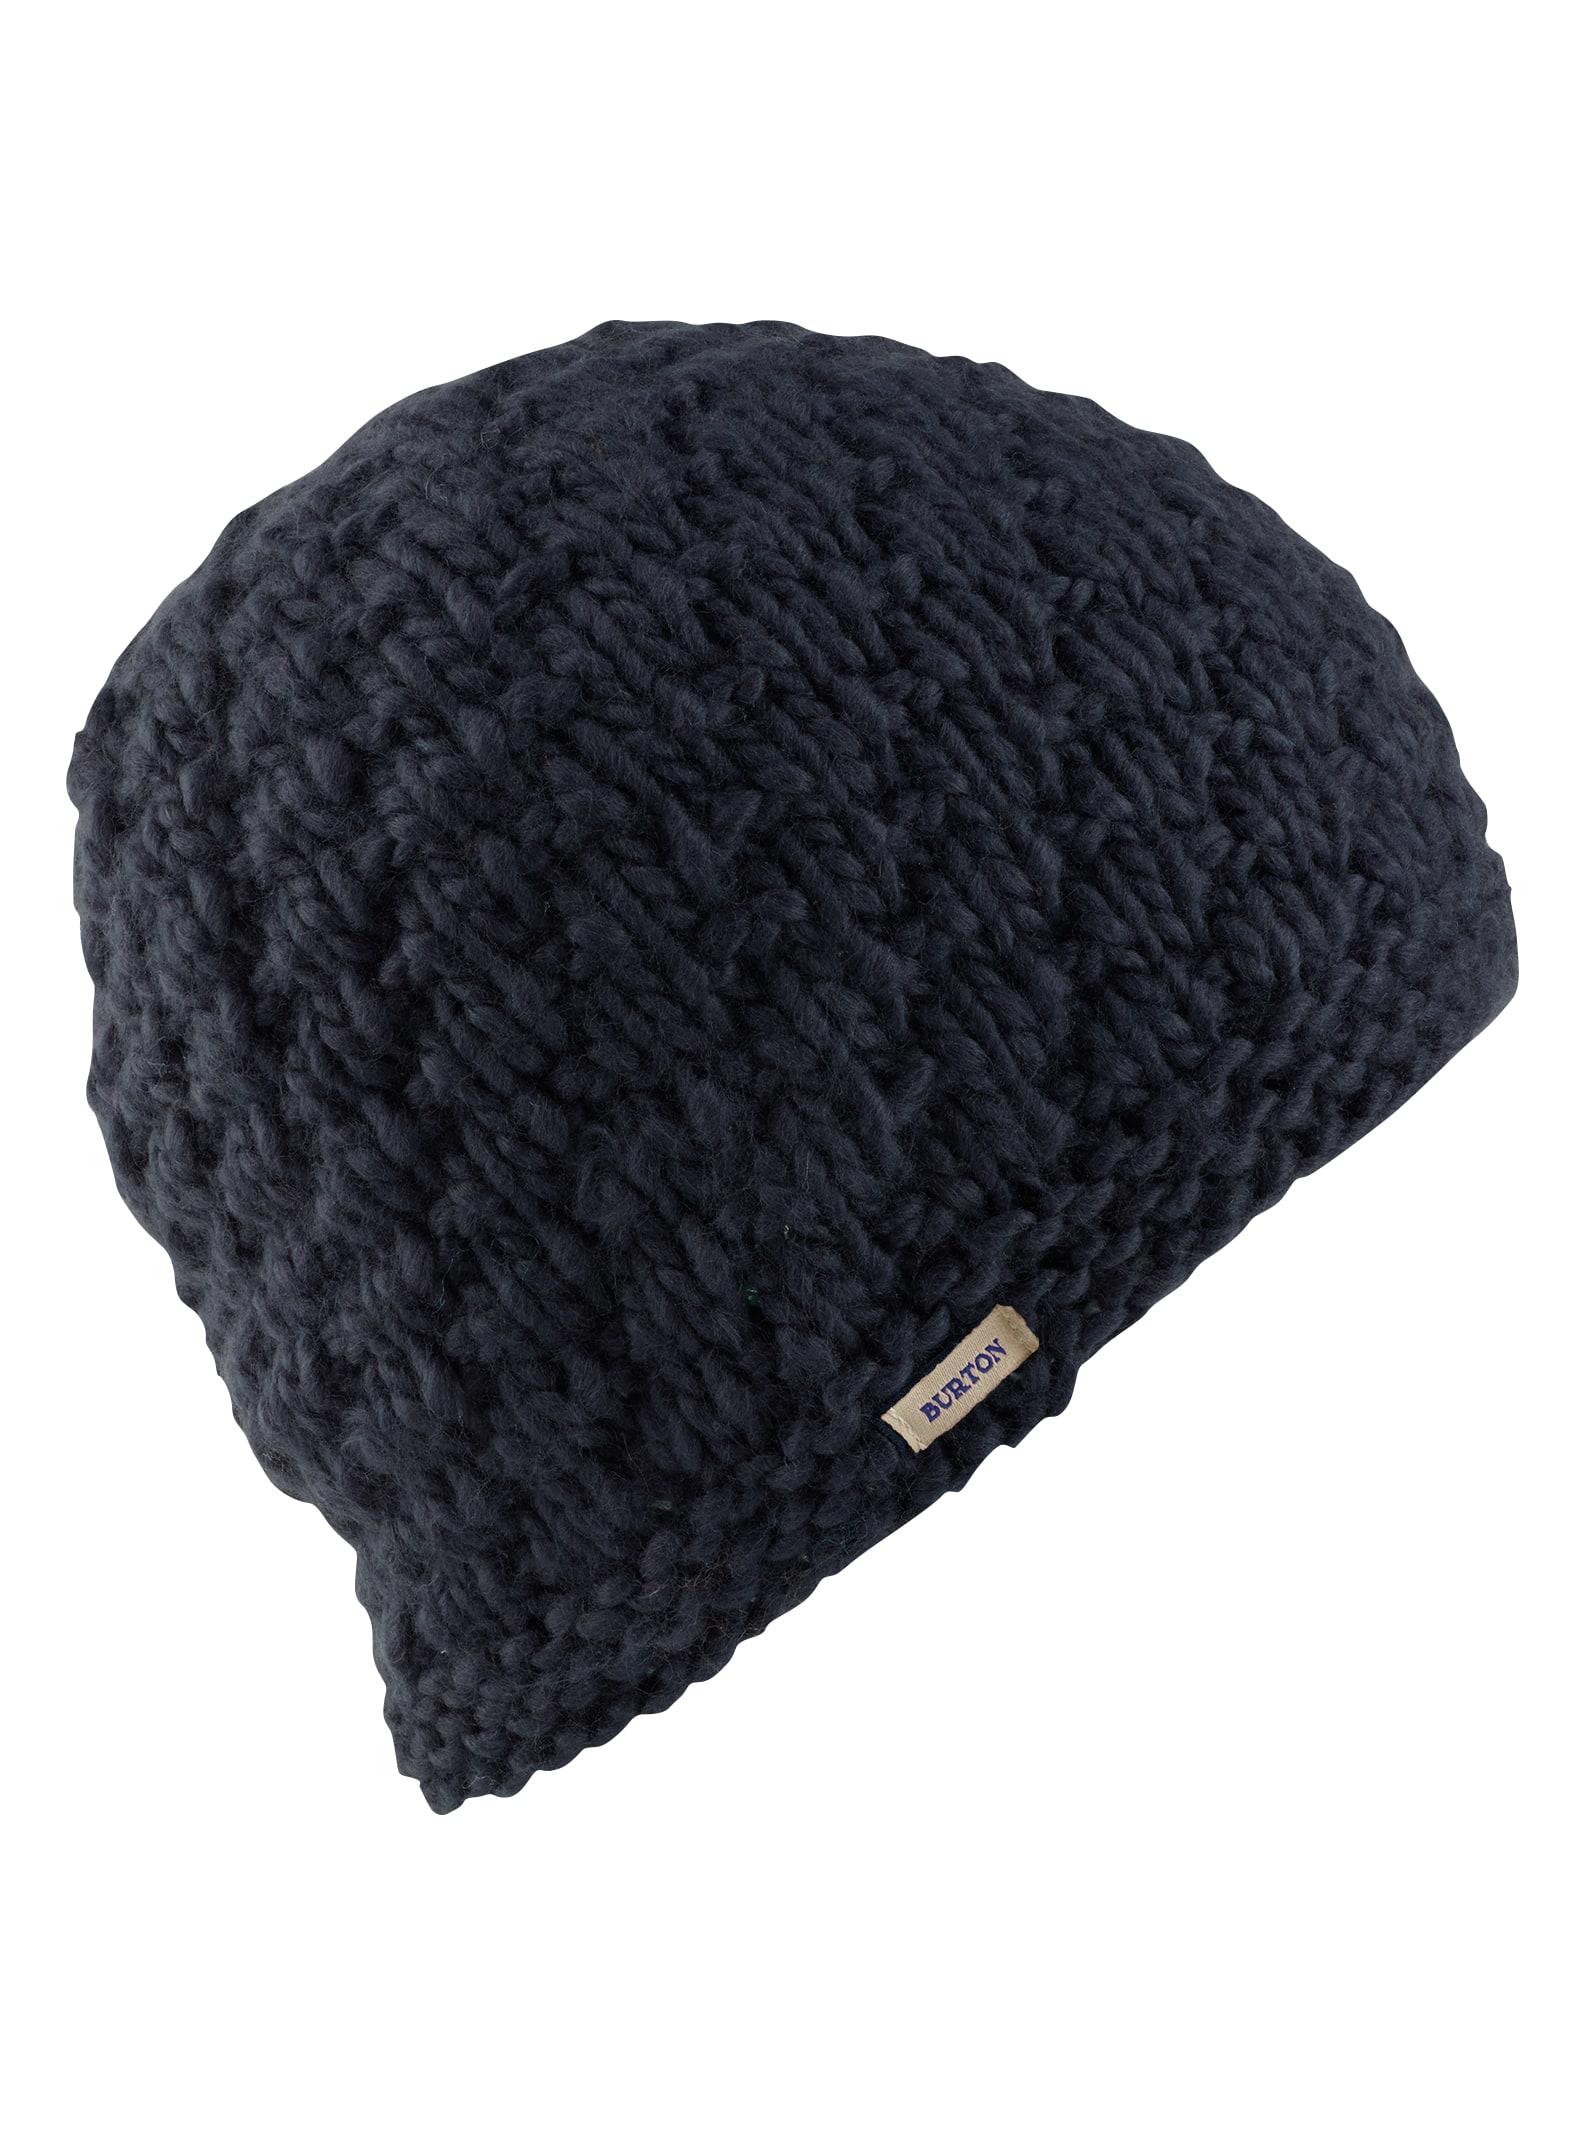 00b21c2121d Women s Sale Hats   Beanies